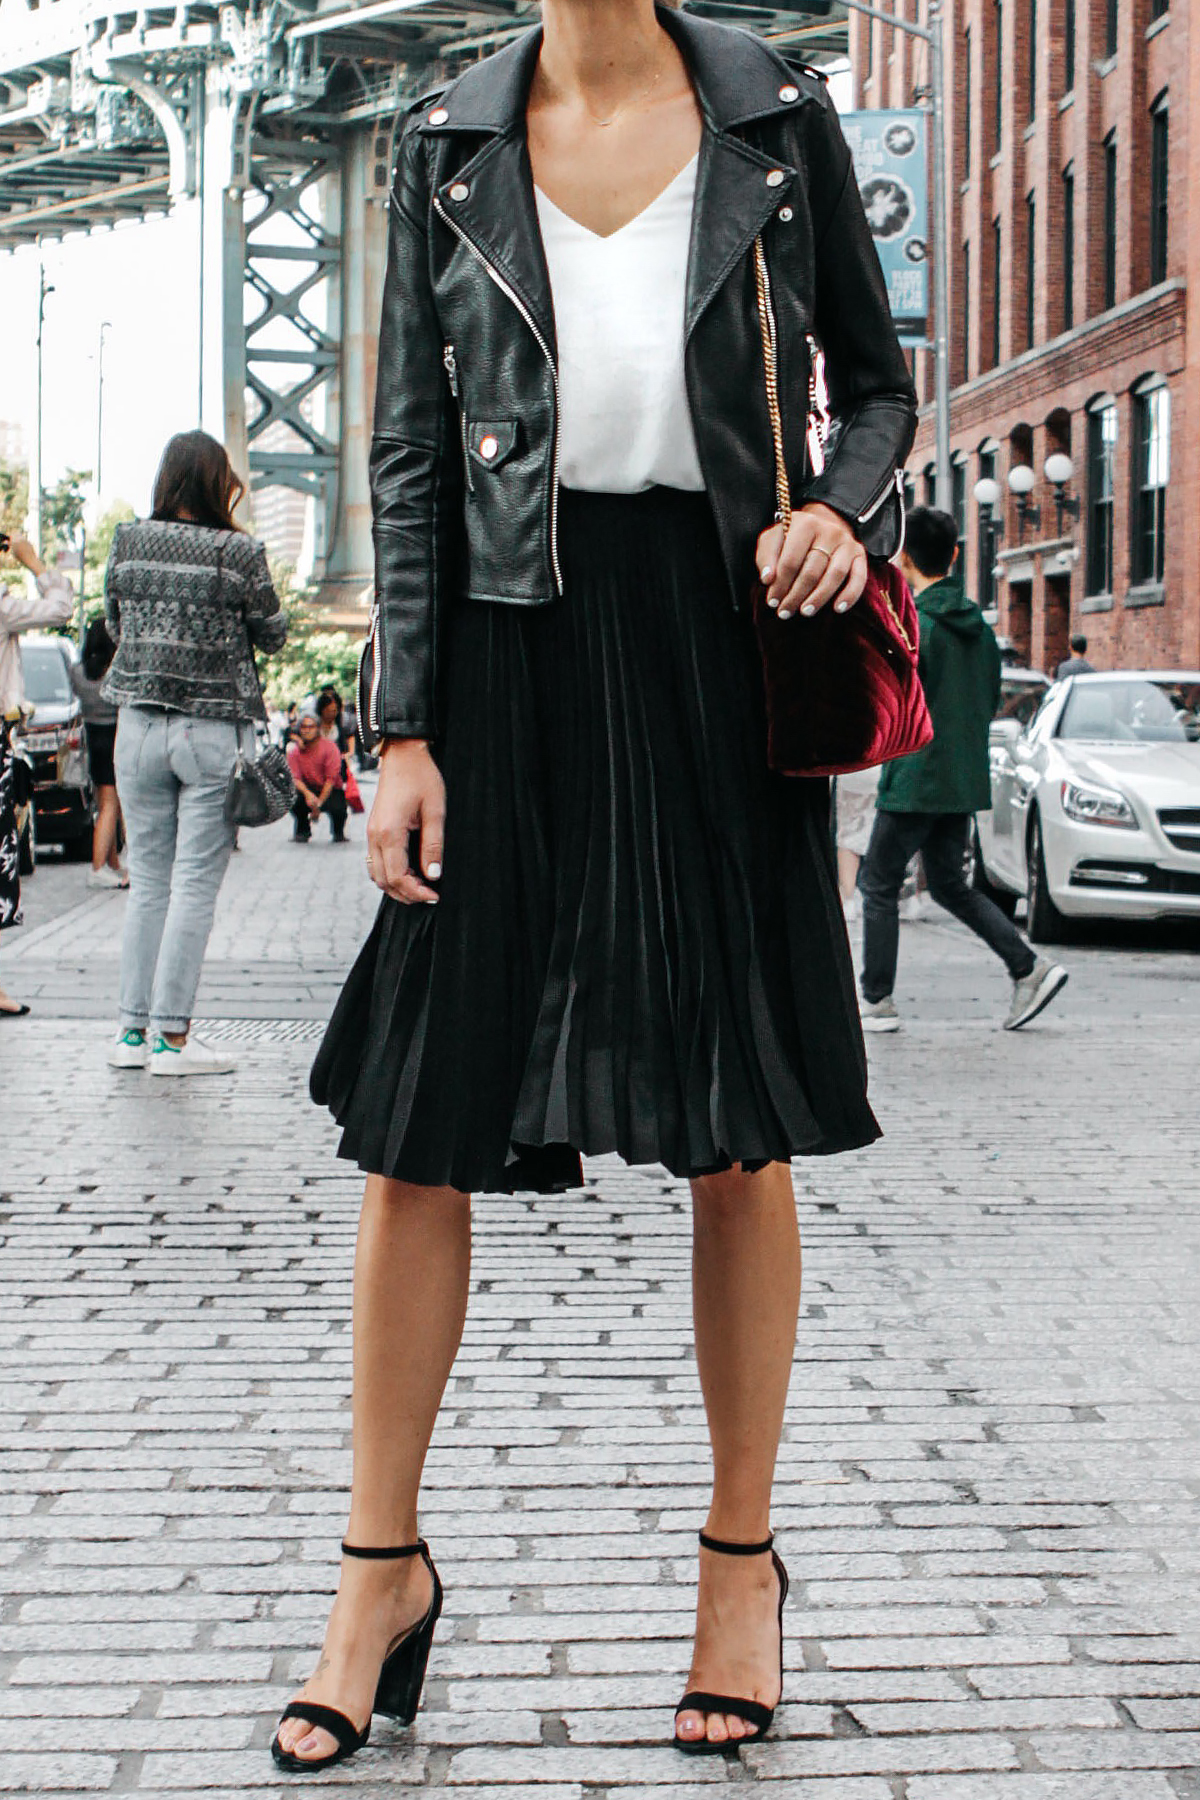 9cc33d67c848 Black Leather Jacket Black Pleated Midi Skirt Saint Laurent Burgundy Velvet  Bag Black Ankle Strap Heeled